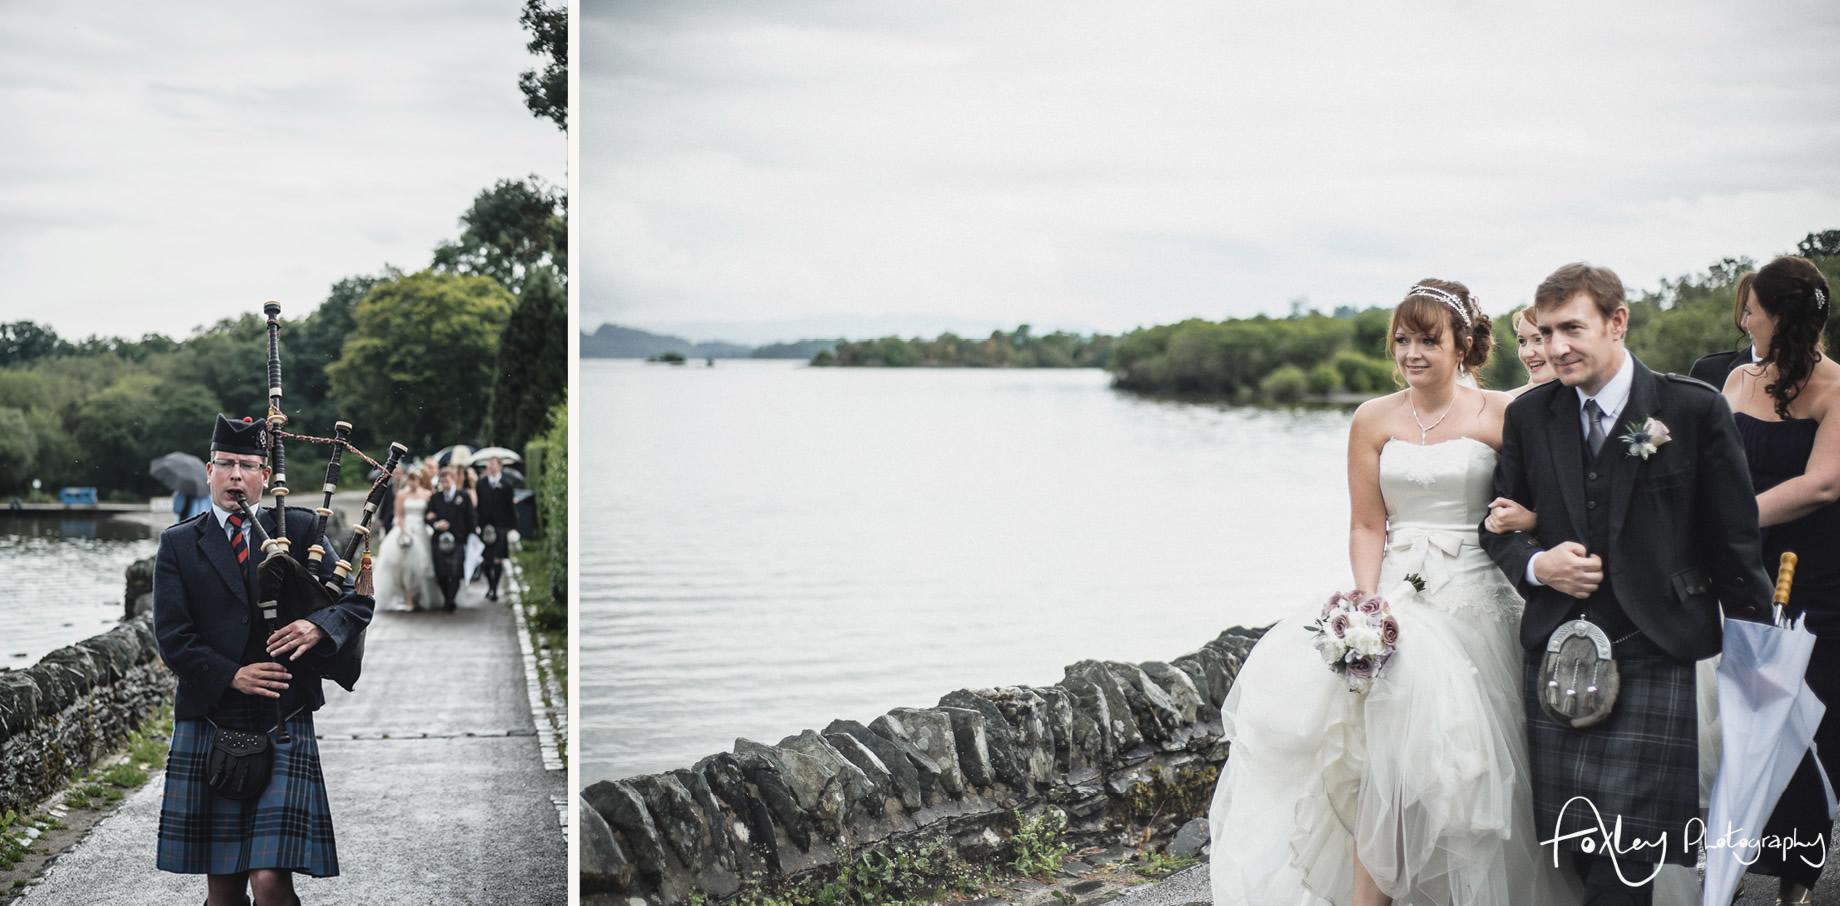 Alys-And-Davids-Wedding-Loch-Lomond-104